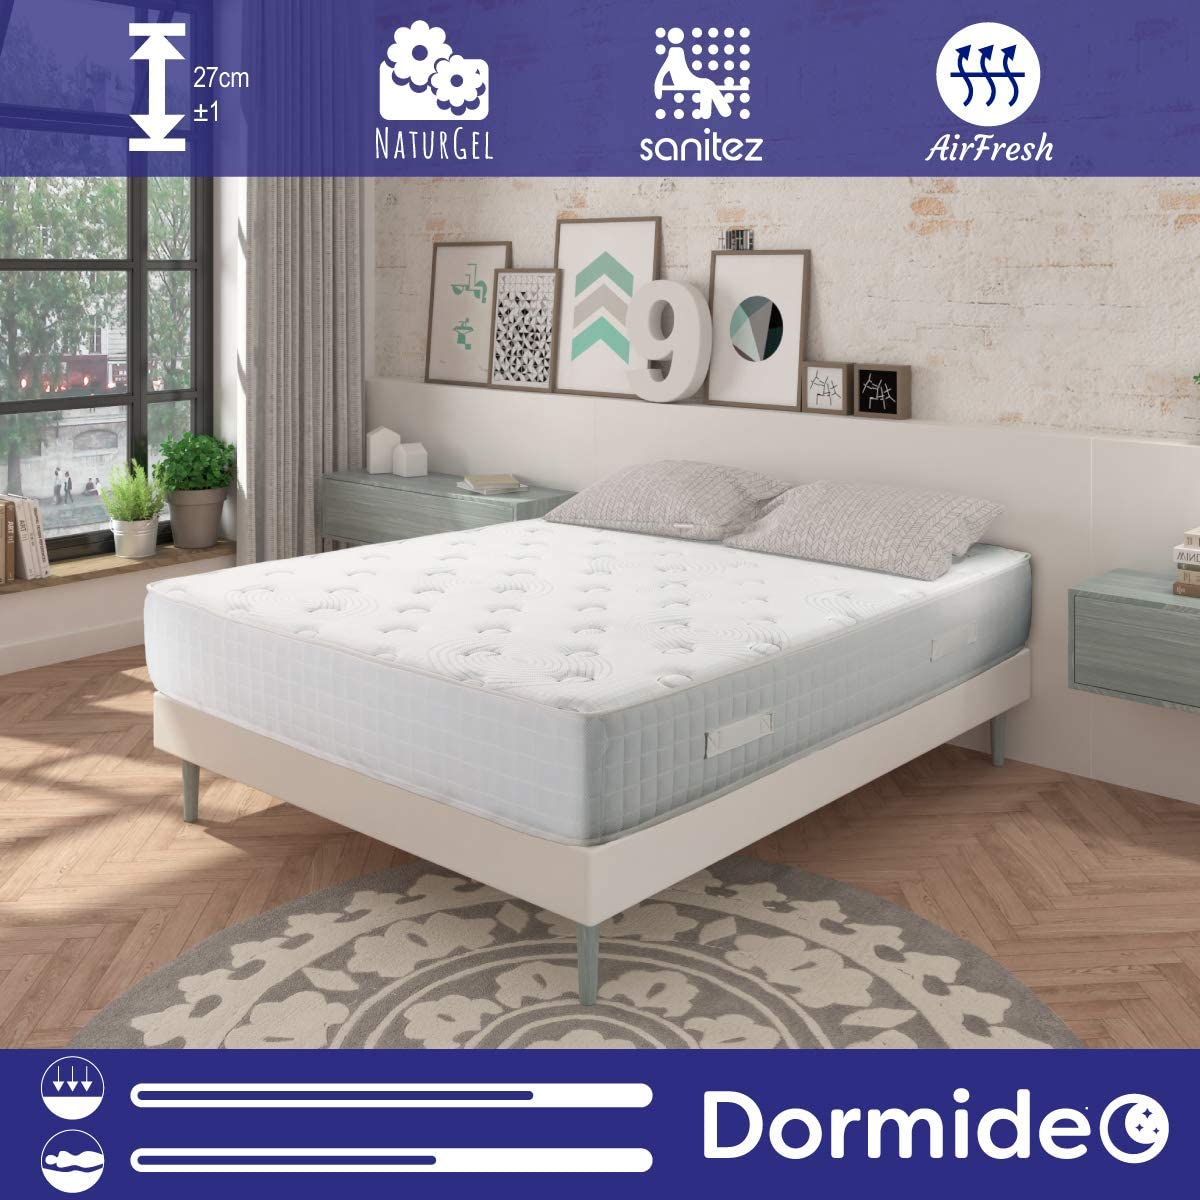 DORMIDEO - Colchón Viscoelástico City Luxury - Fibras ecológicas Cashmere, Antibacterias, 135x190cm